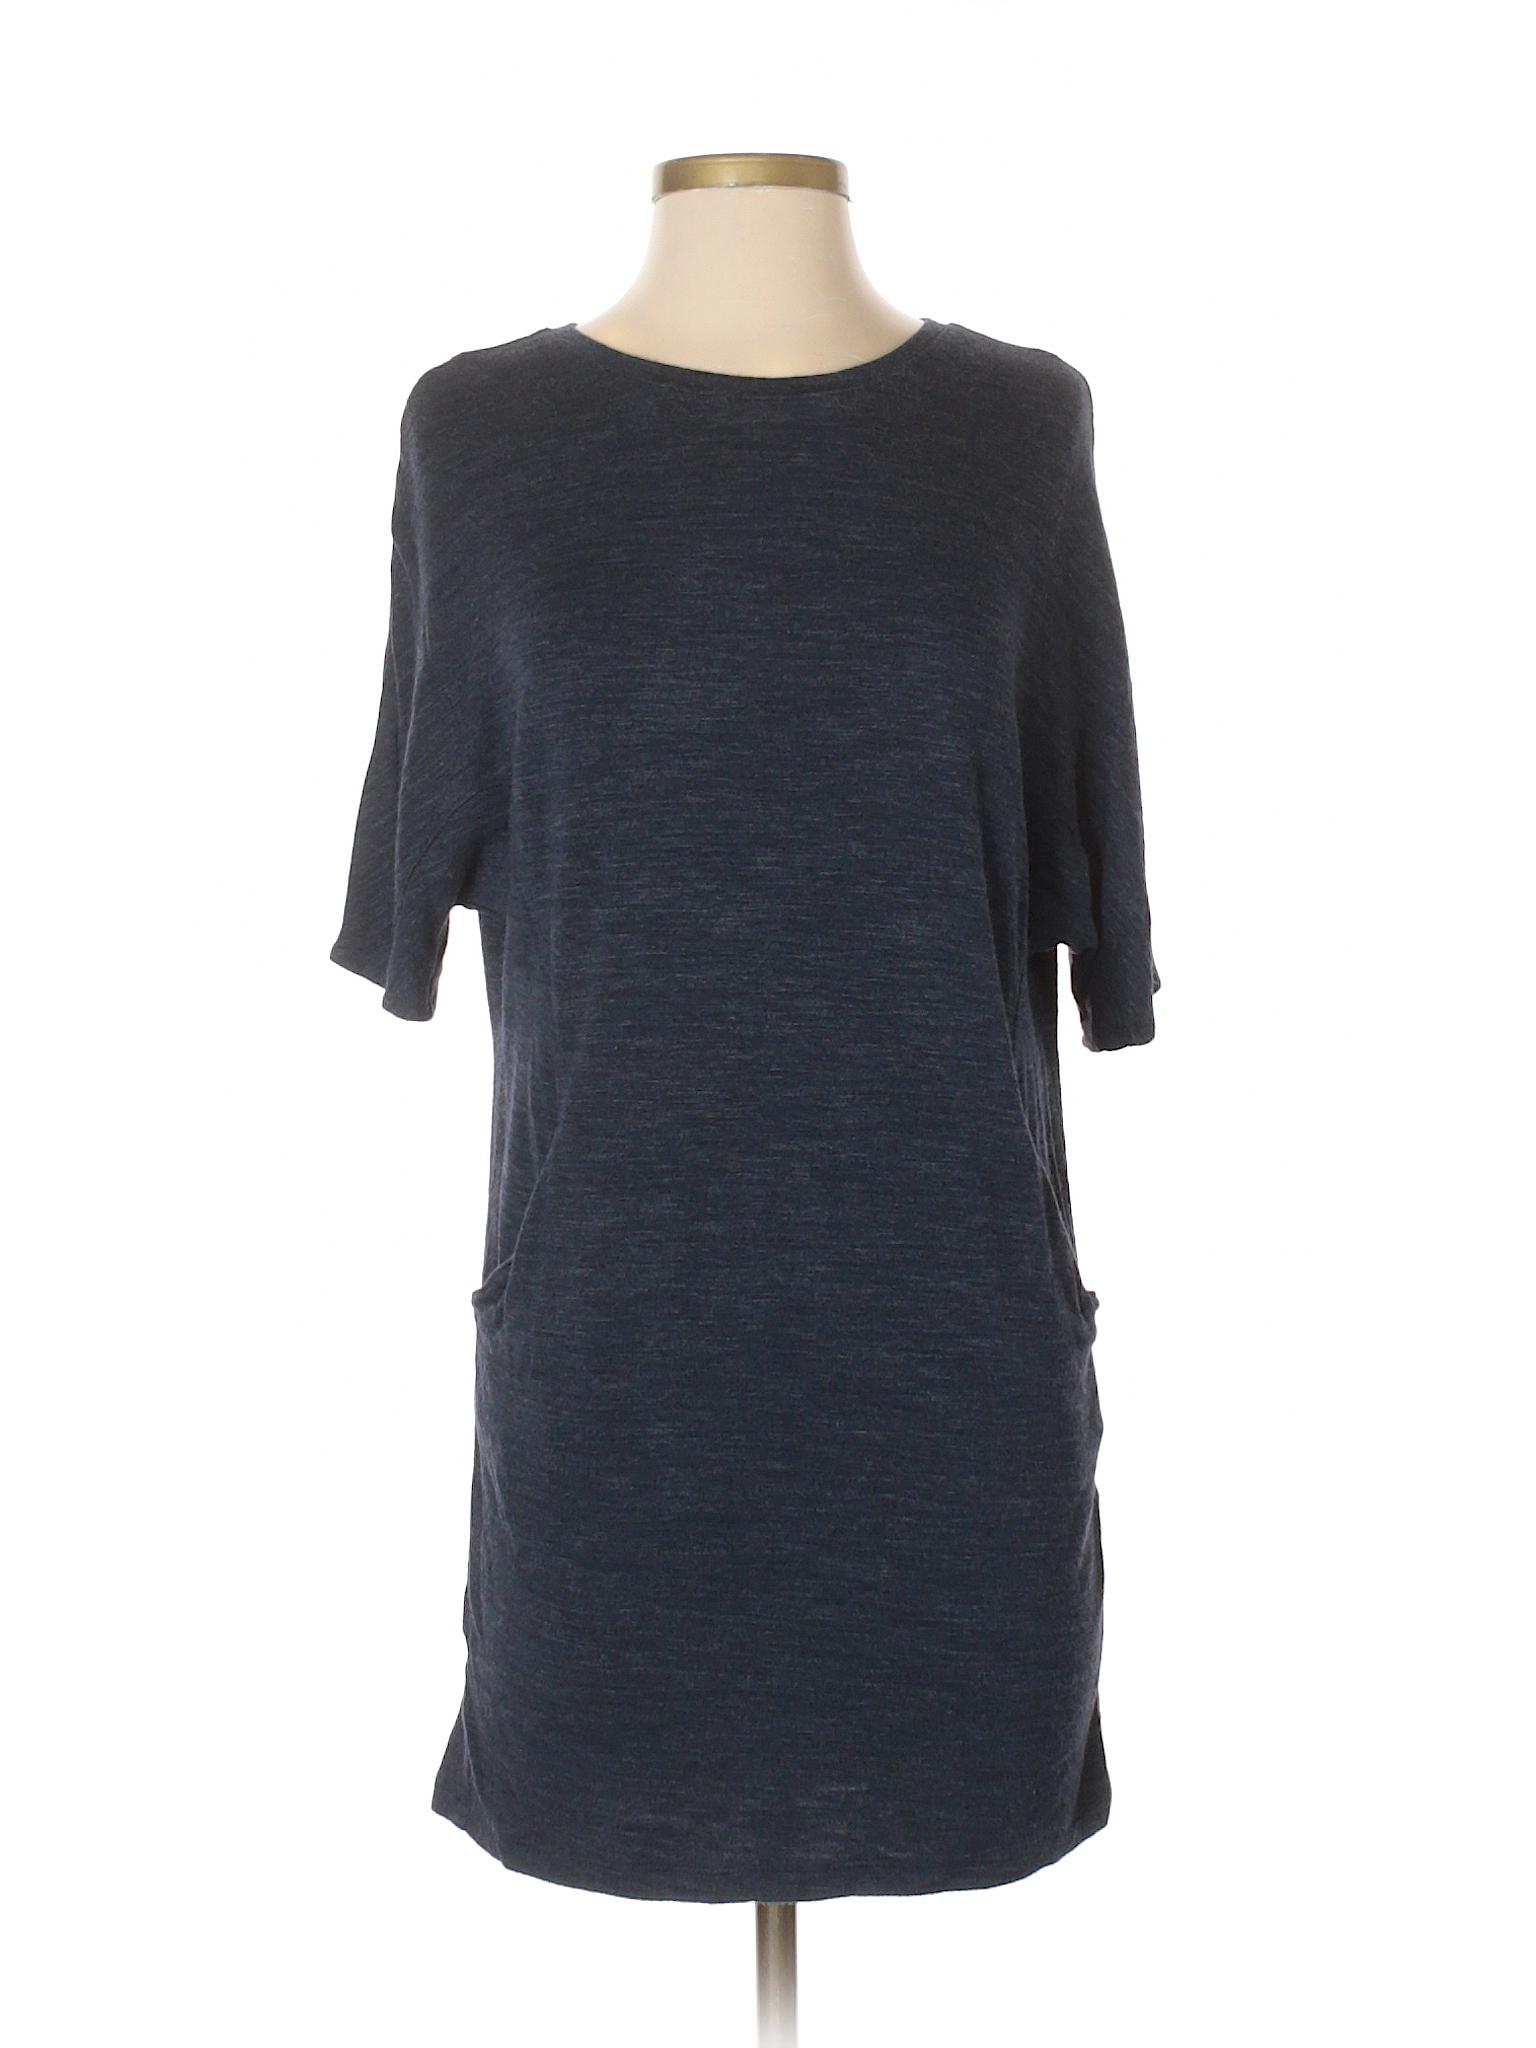 Grey Selling amp; Dress Casual Lou gxEaC1qwX